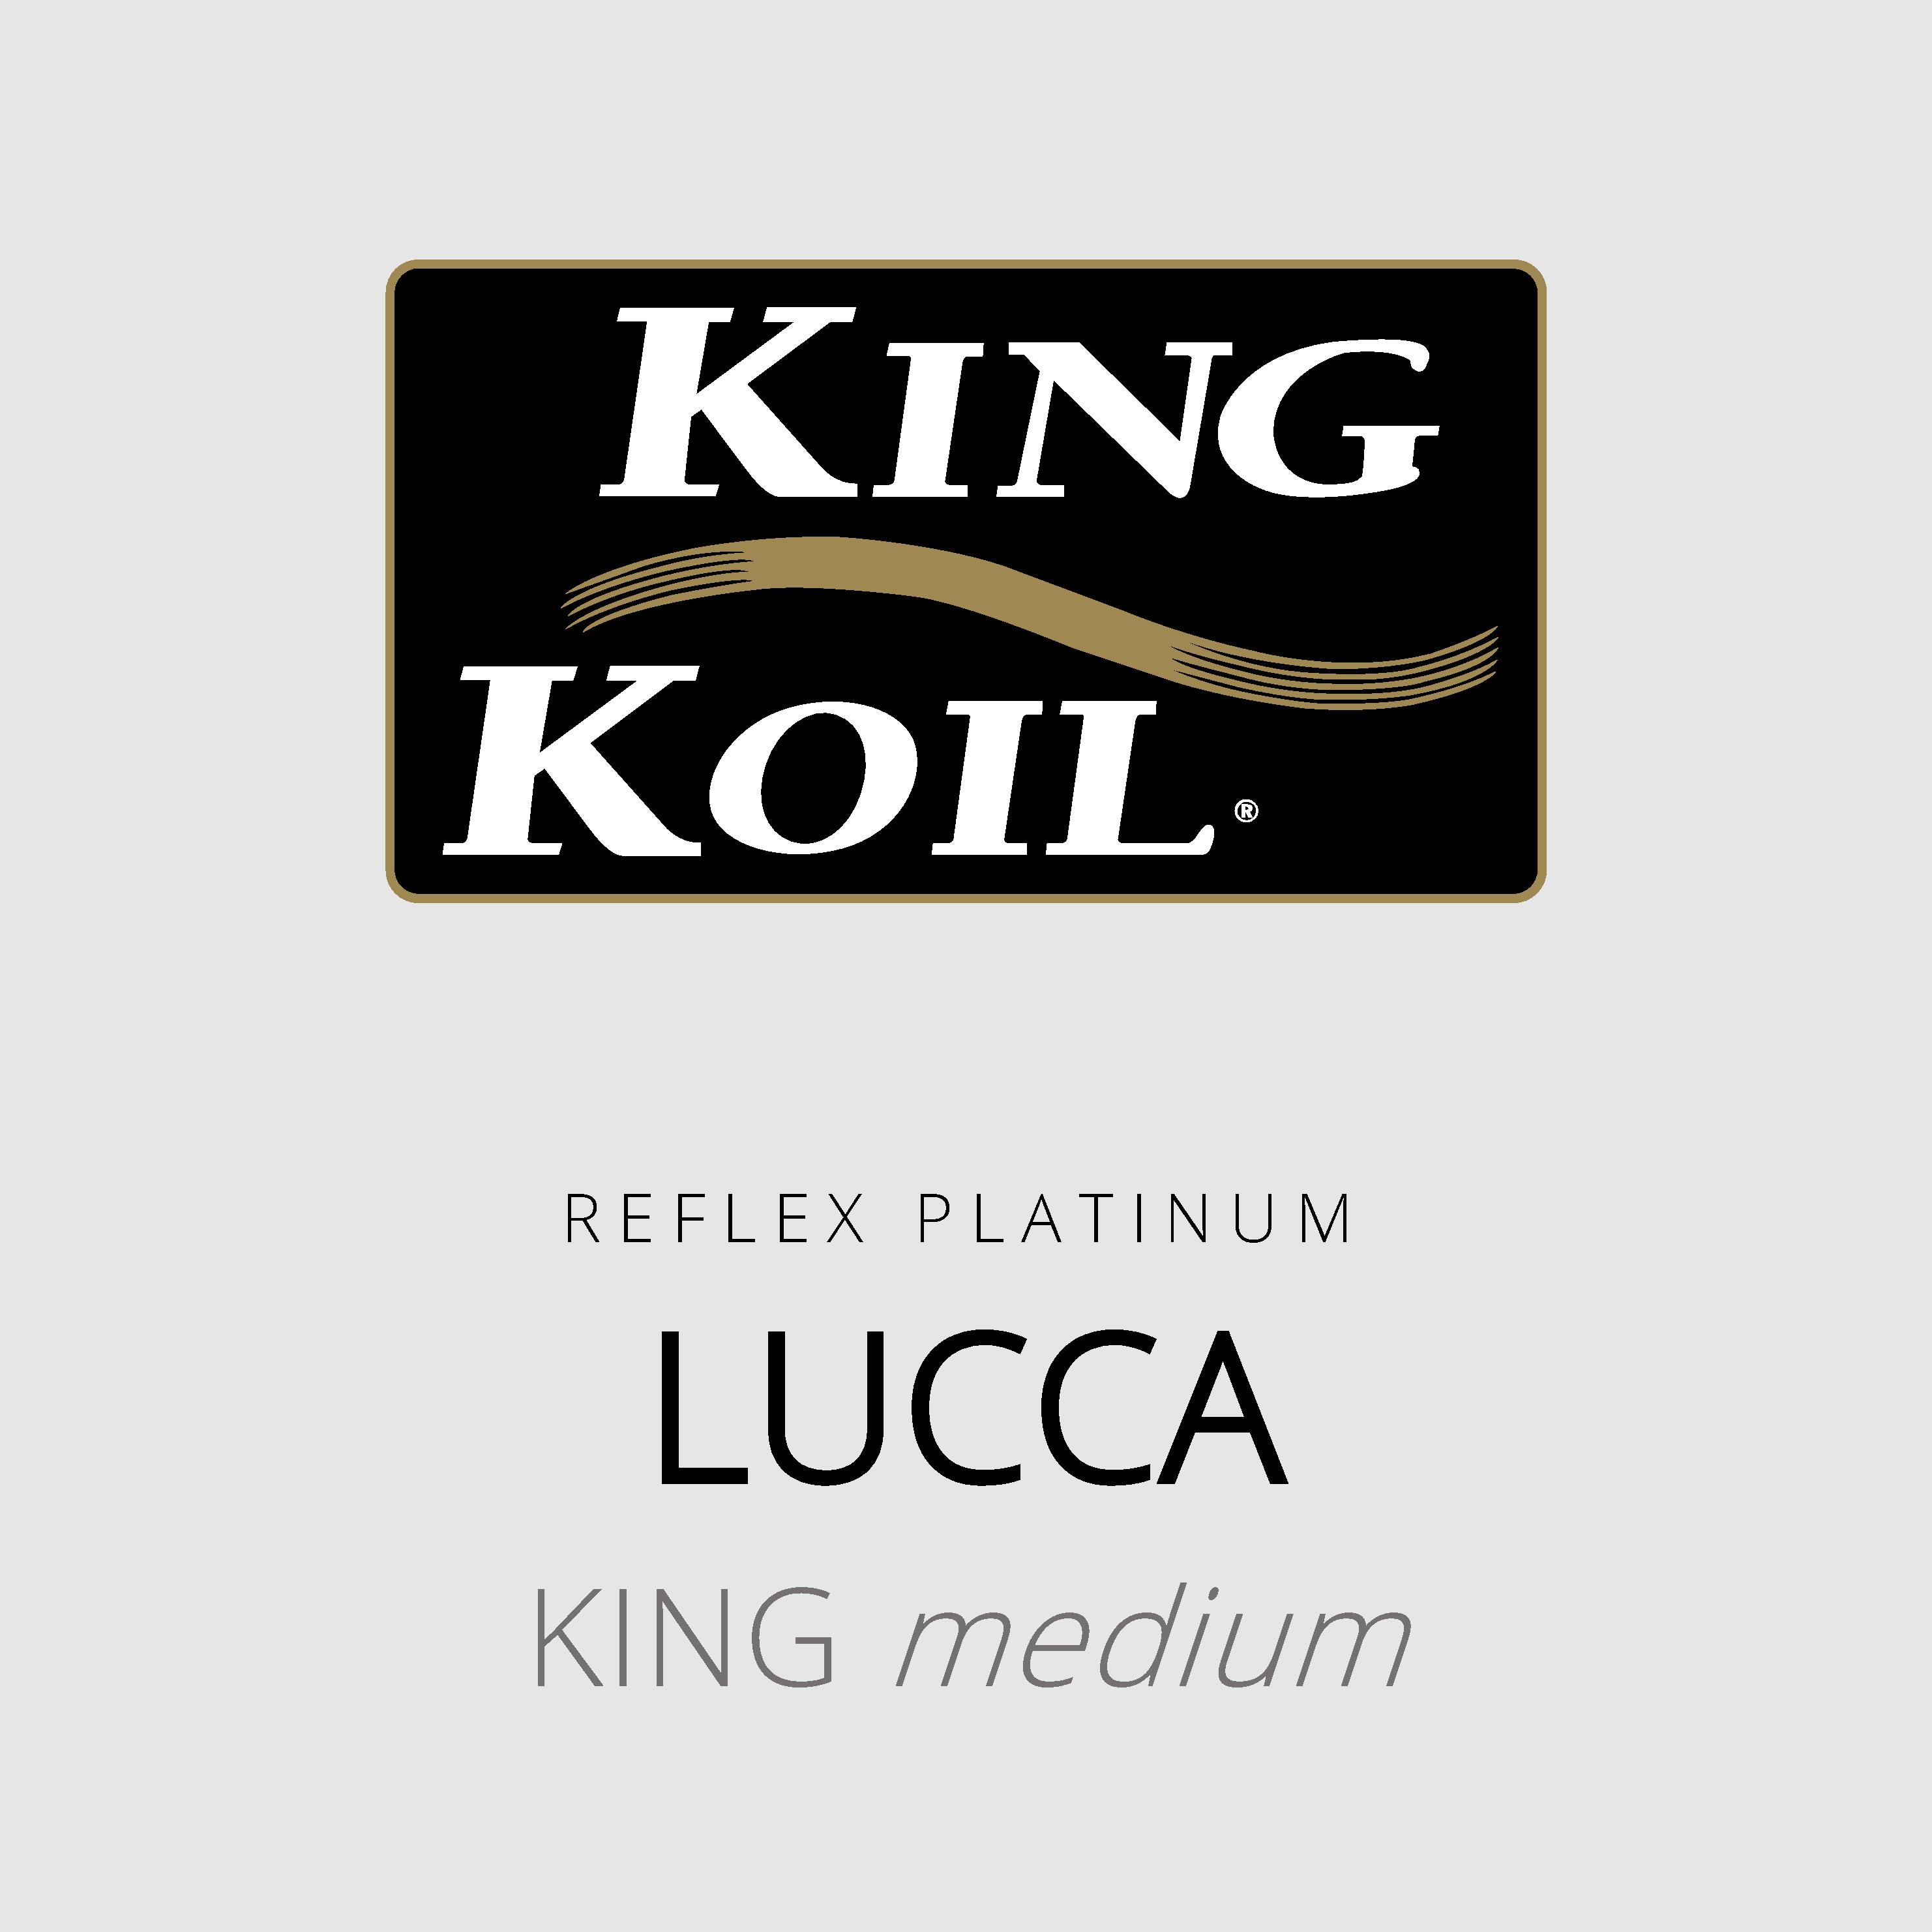 King Koil – Lucca – Reflex Platinum – King Medium Mattress